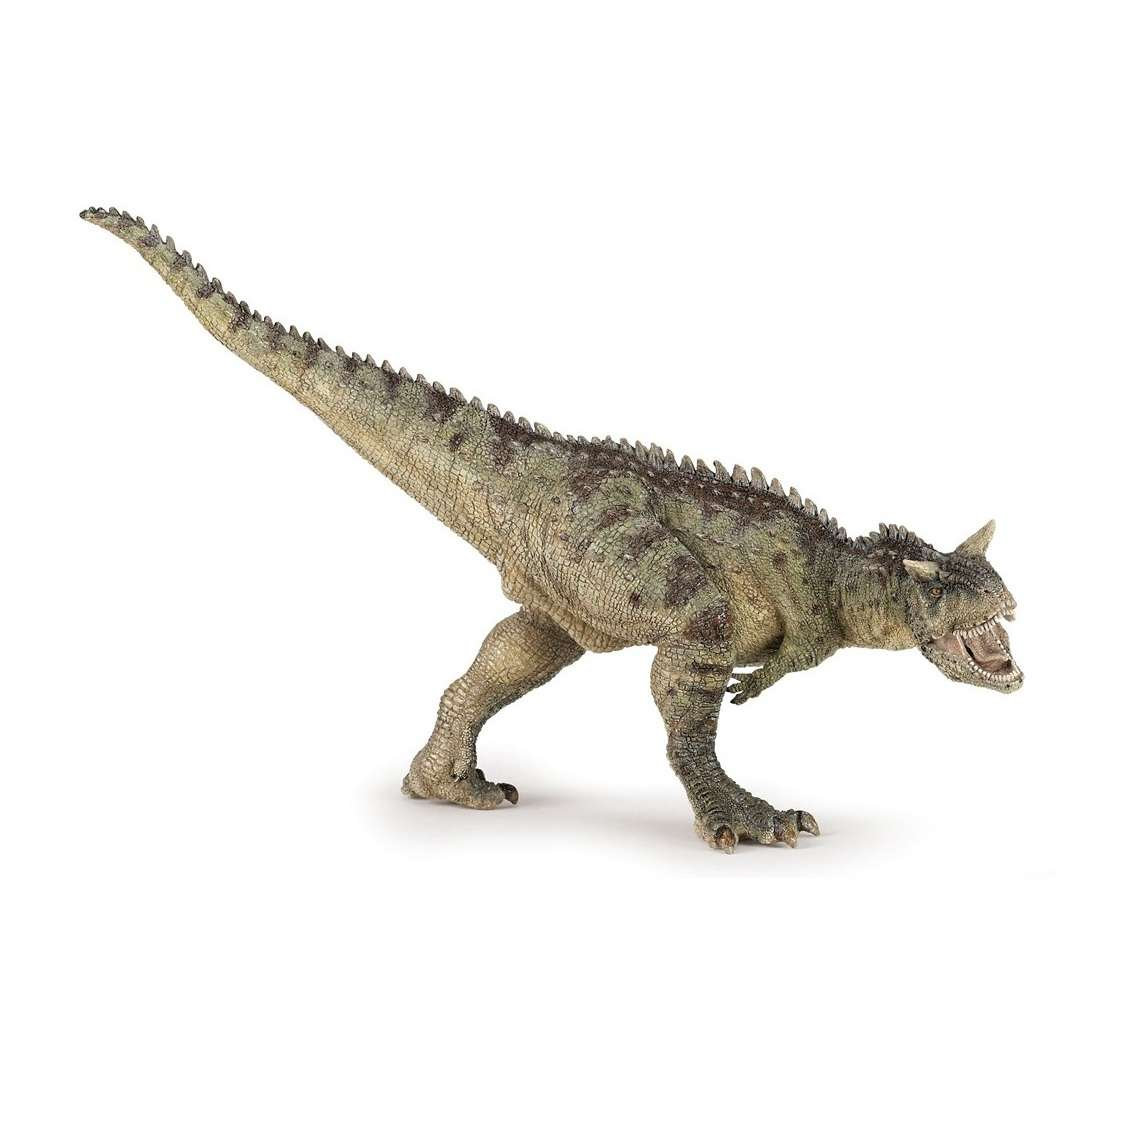 Animal Figure: Dinosaur - Carnotaurus, 55032 Photo